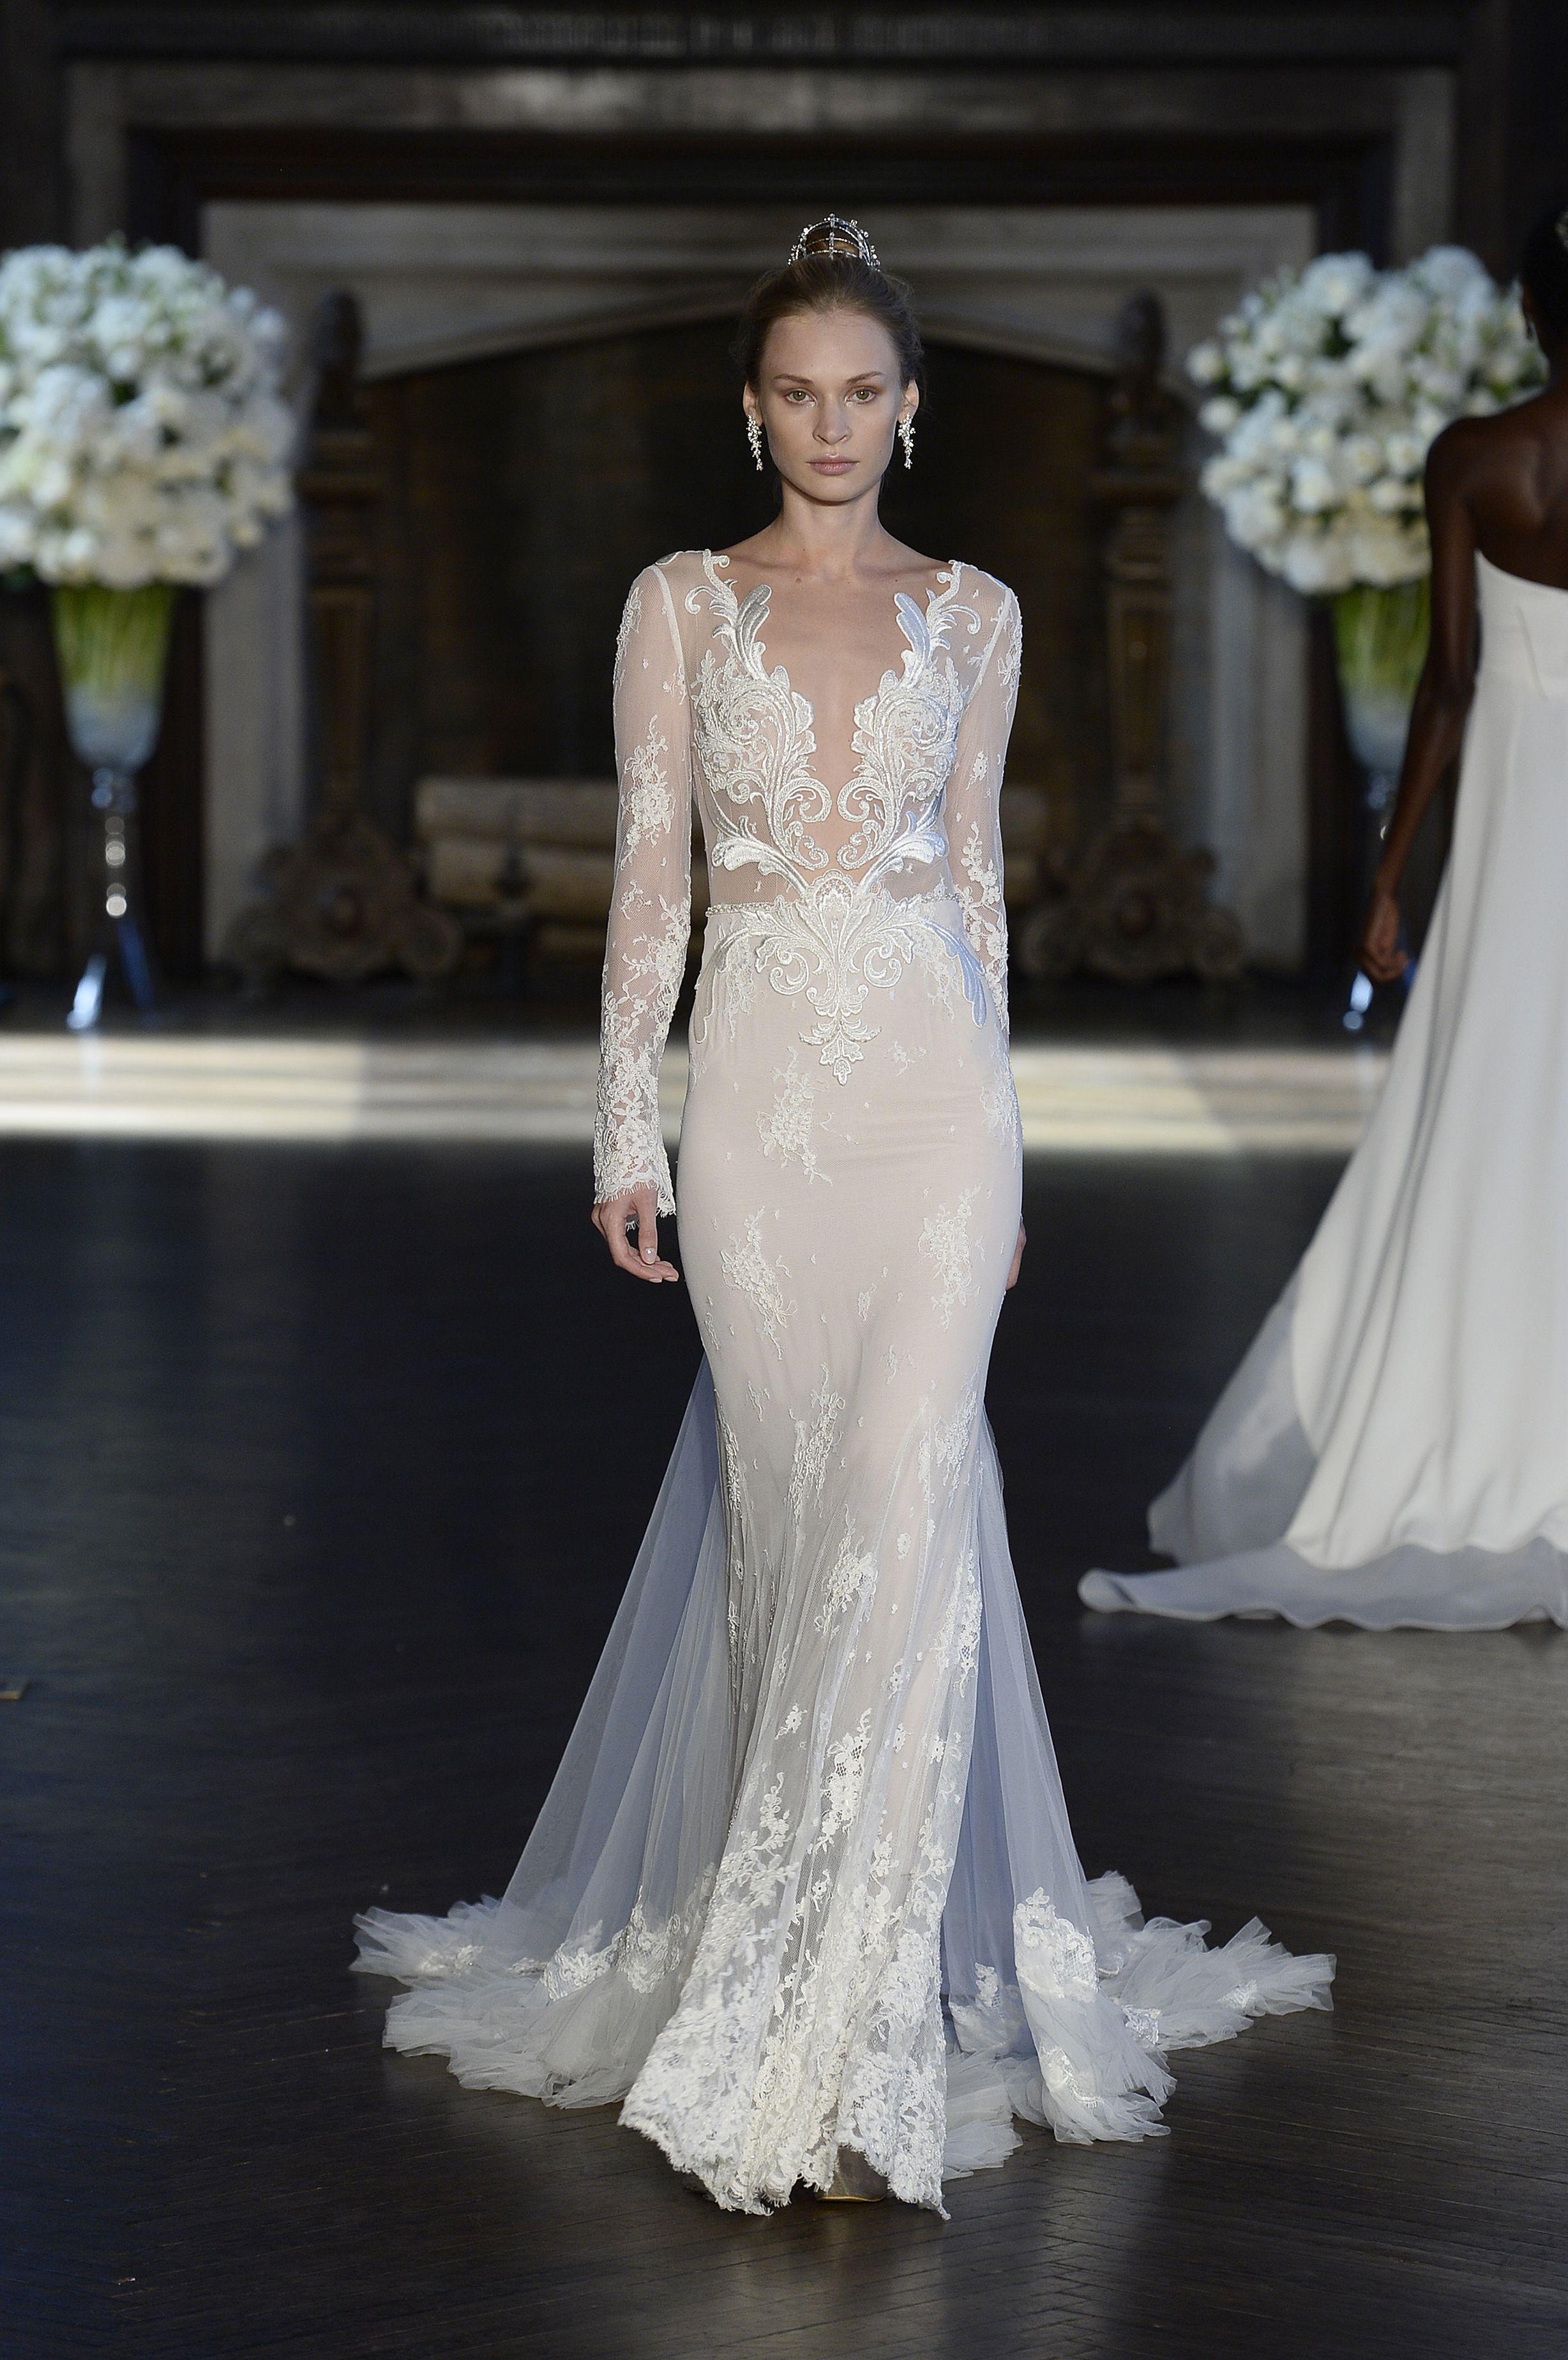 Bridal Fashion Week Wedding Dresses We Love For These 11 Engaged Celebs photo